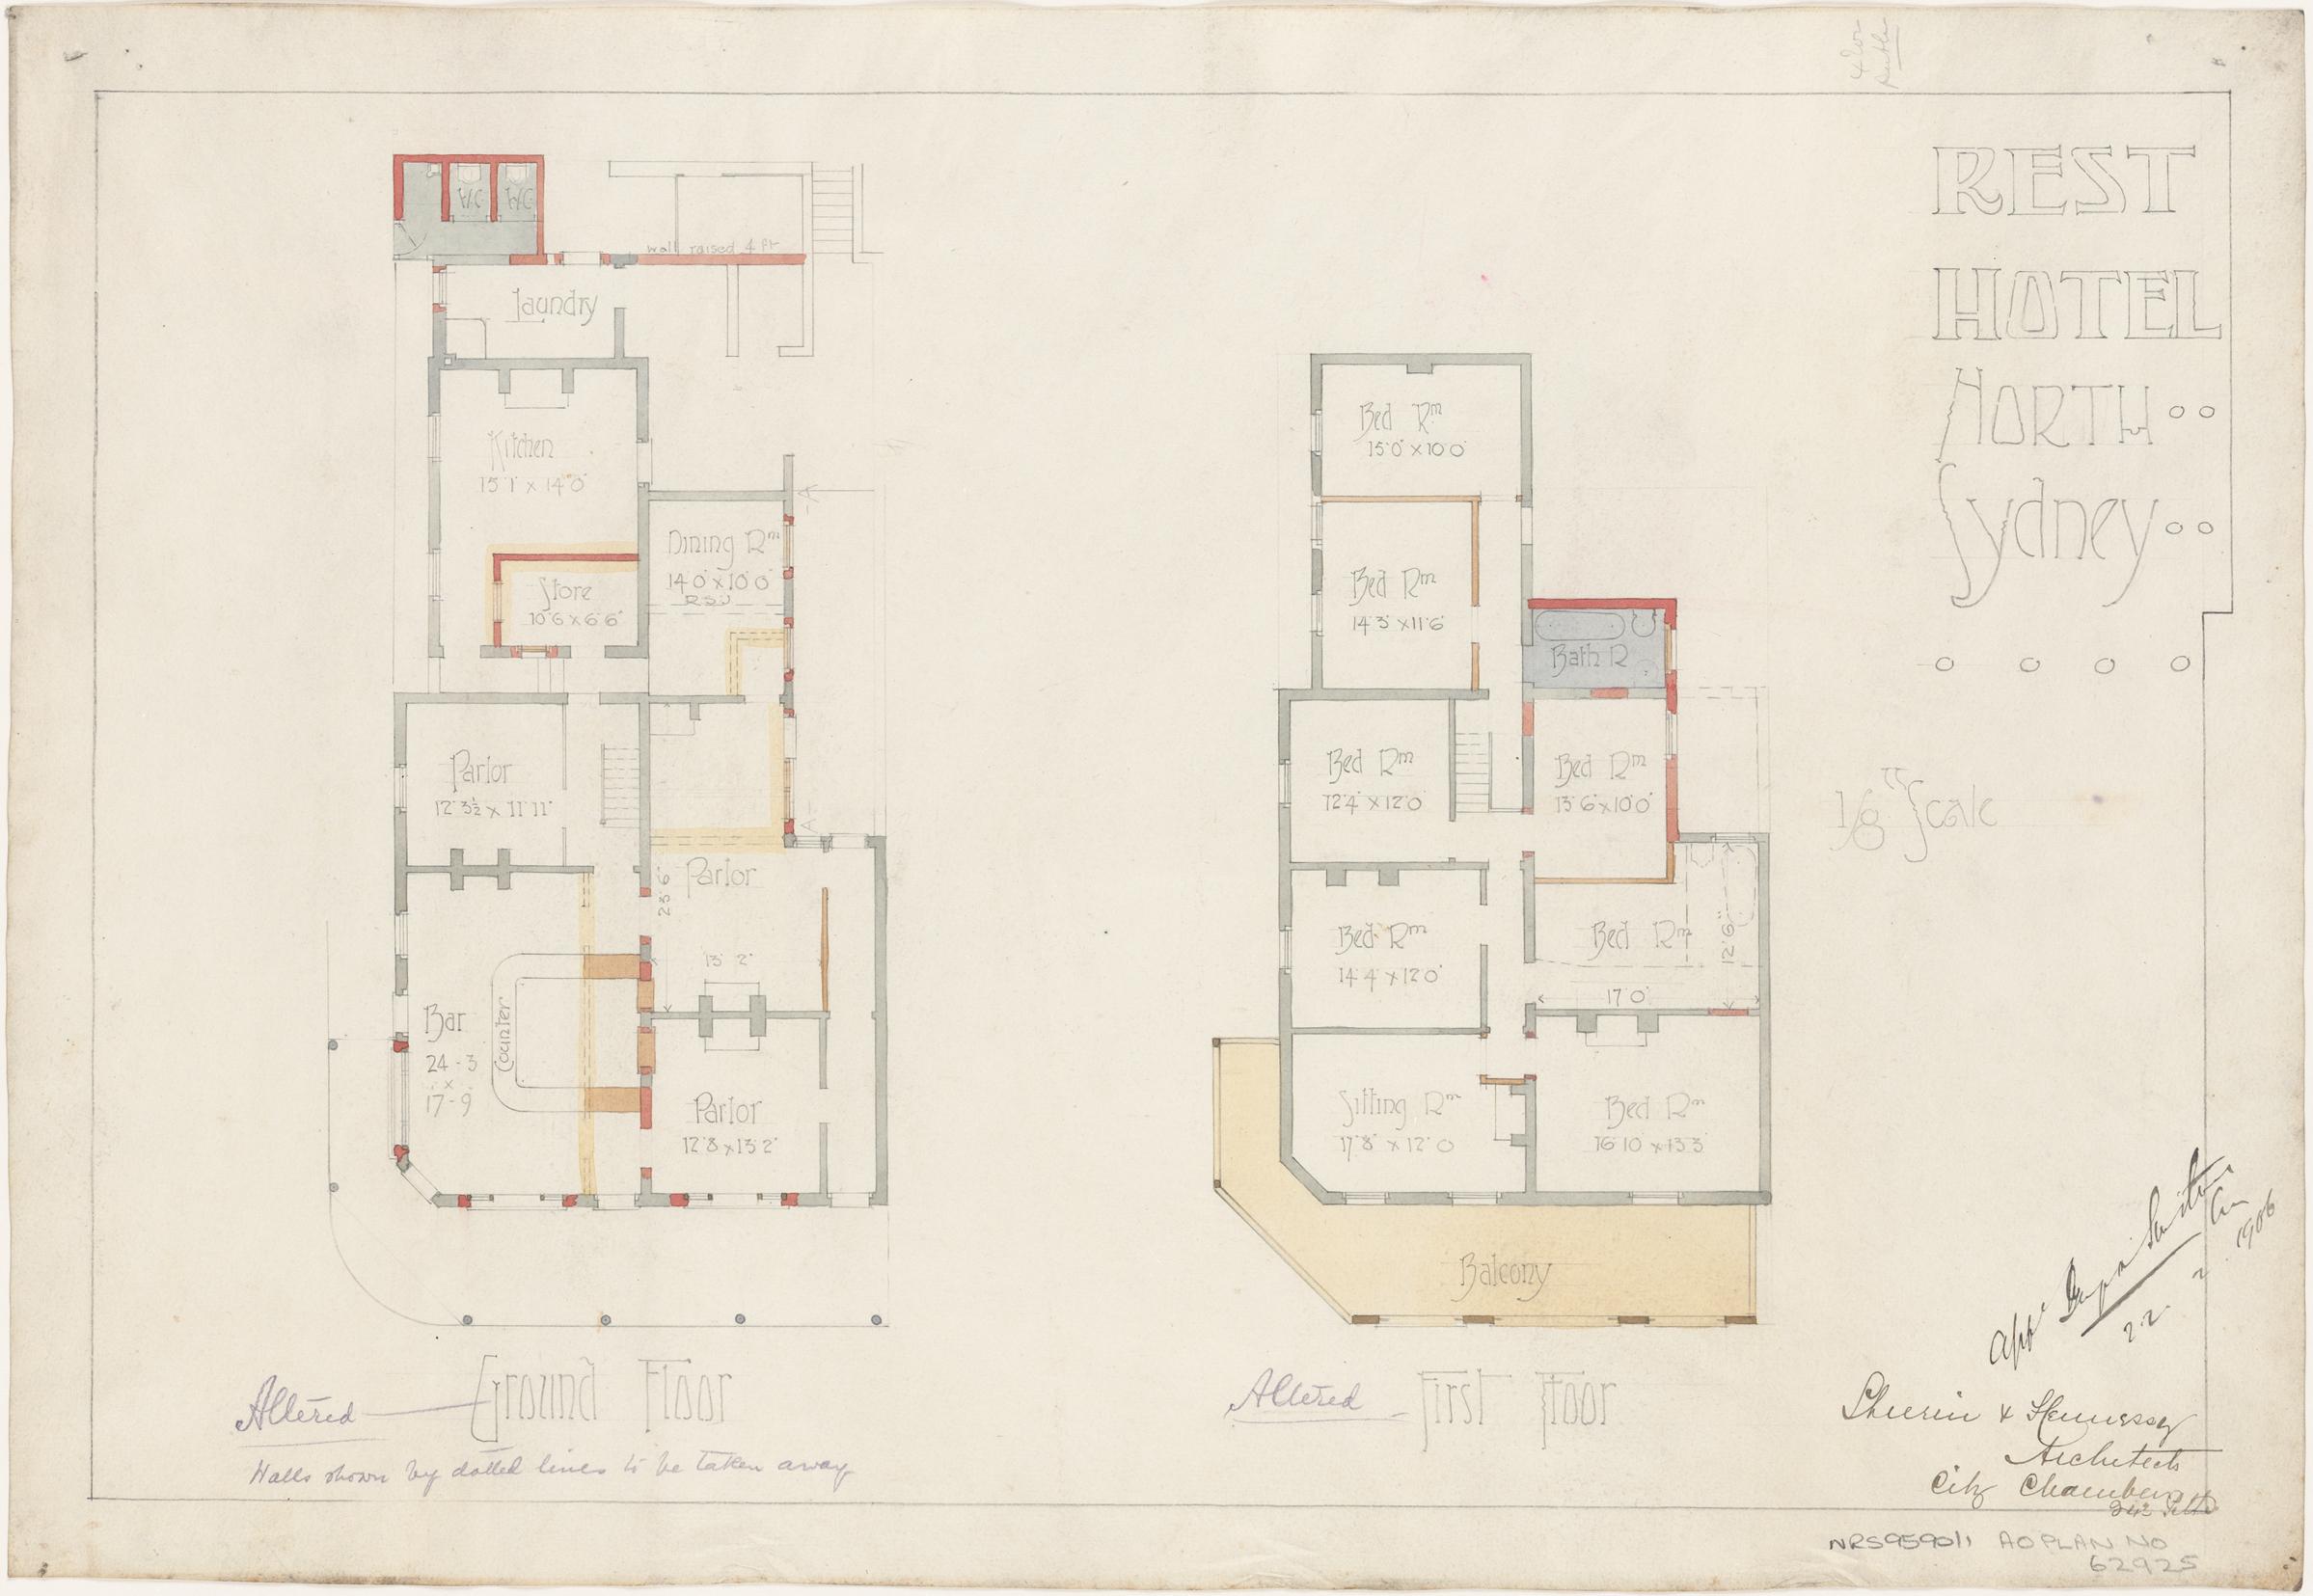 plans of licensed premises hotel plans metropolitan licensing